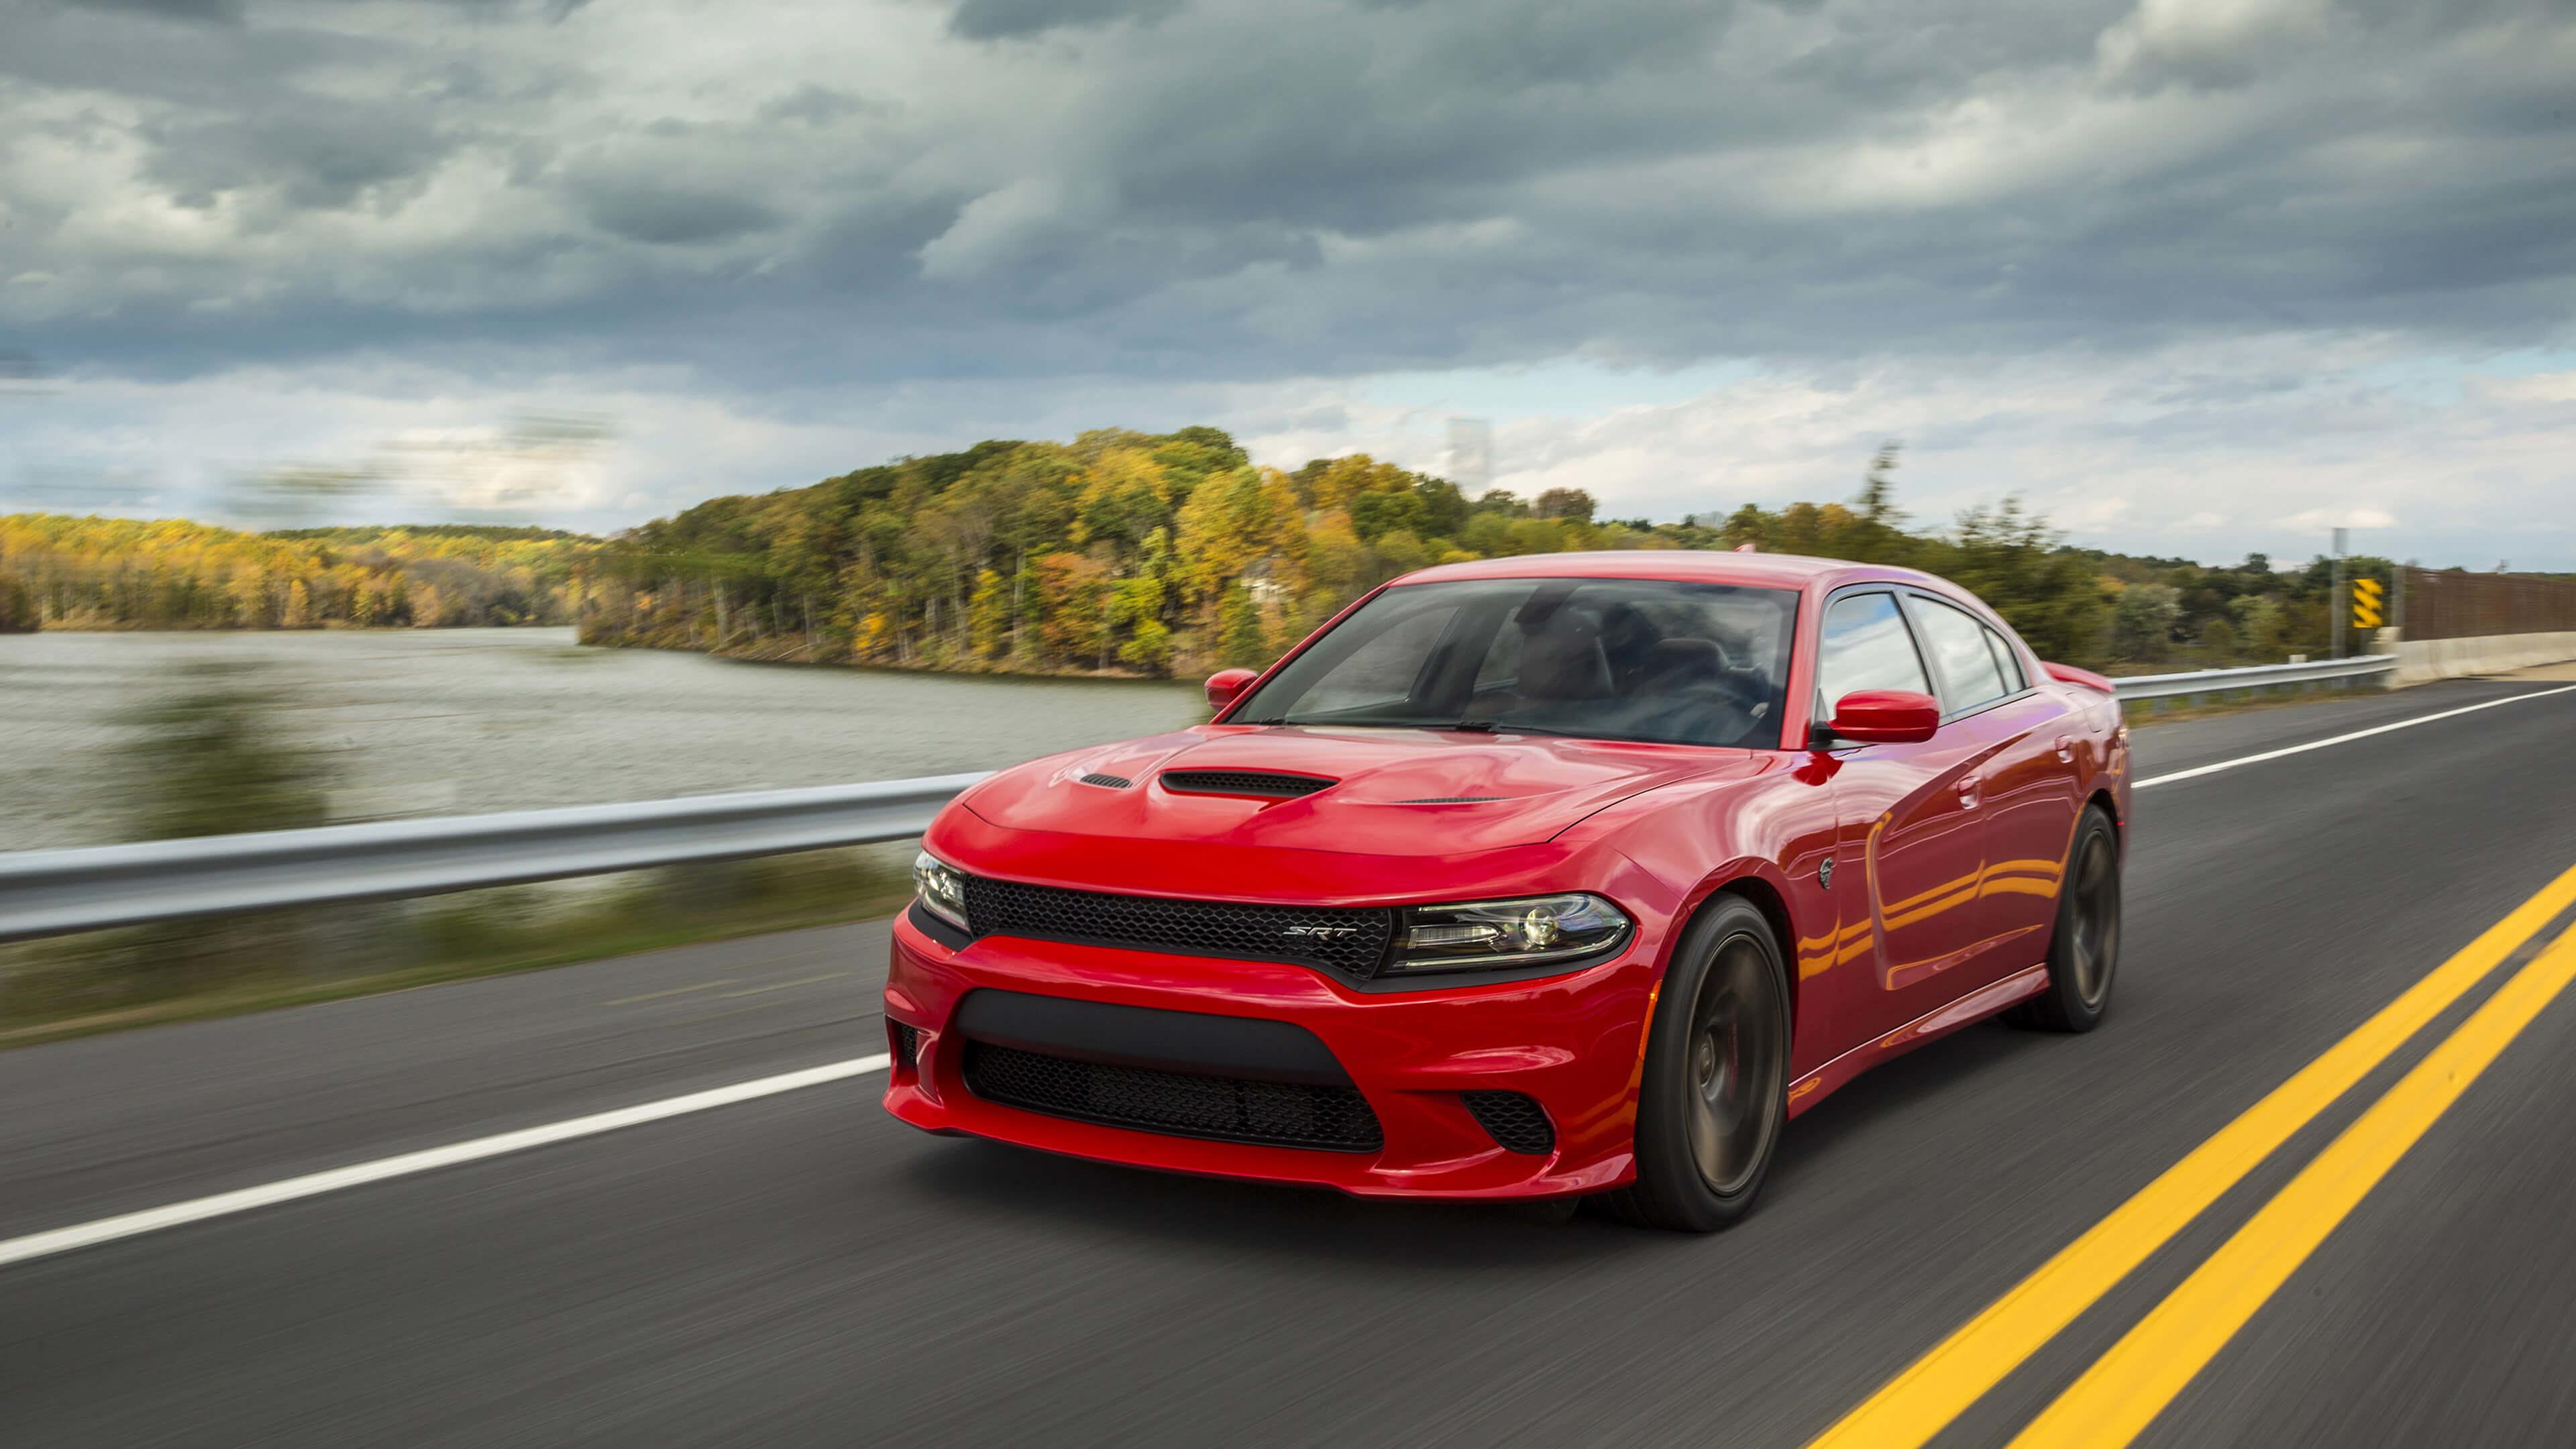 Dodge Challenger Hellcat Wallpaper Hd 65 Images